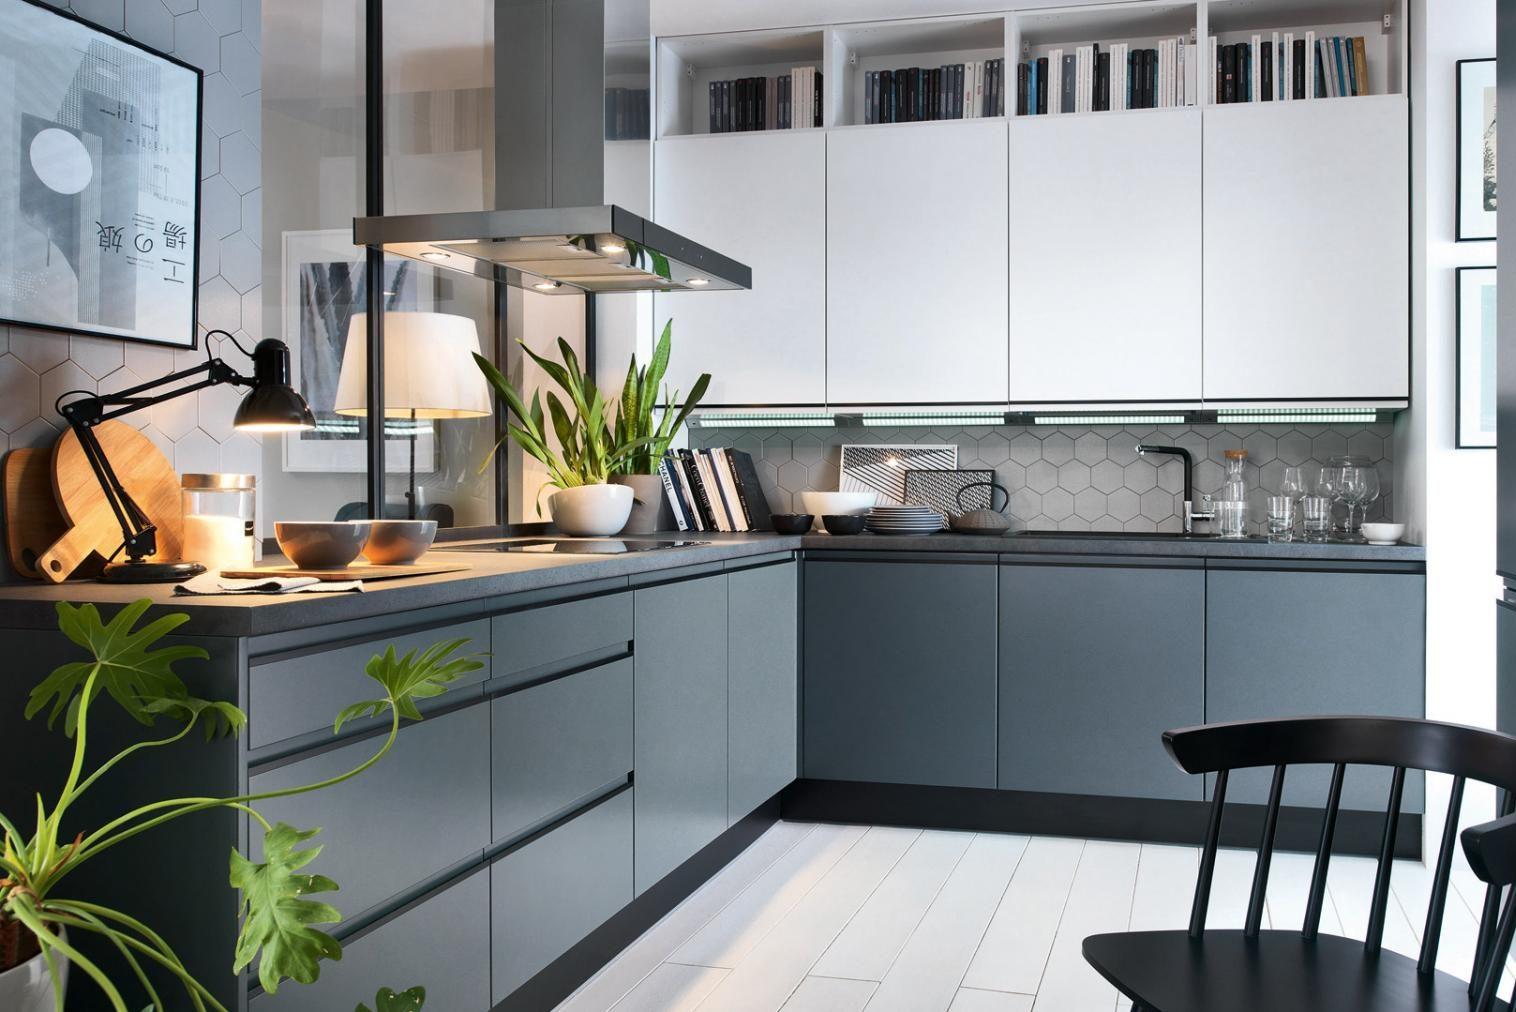 elysee_street BRW - kuchnie